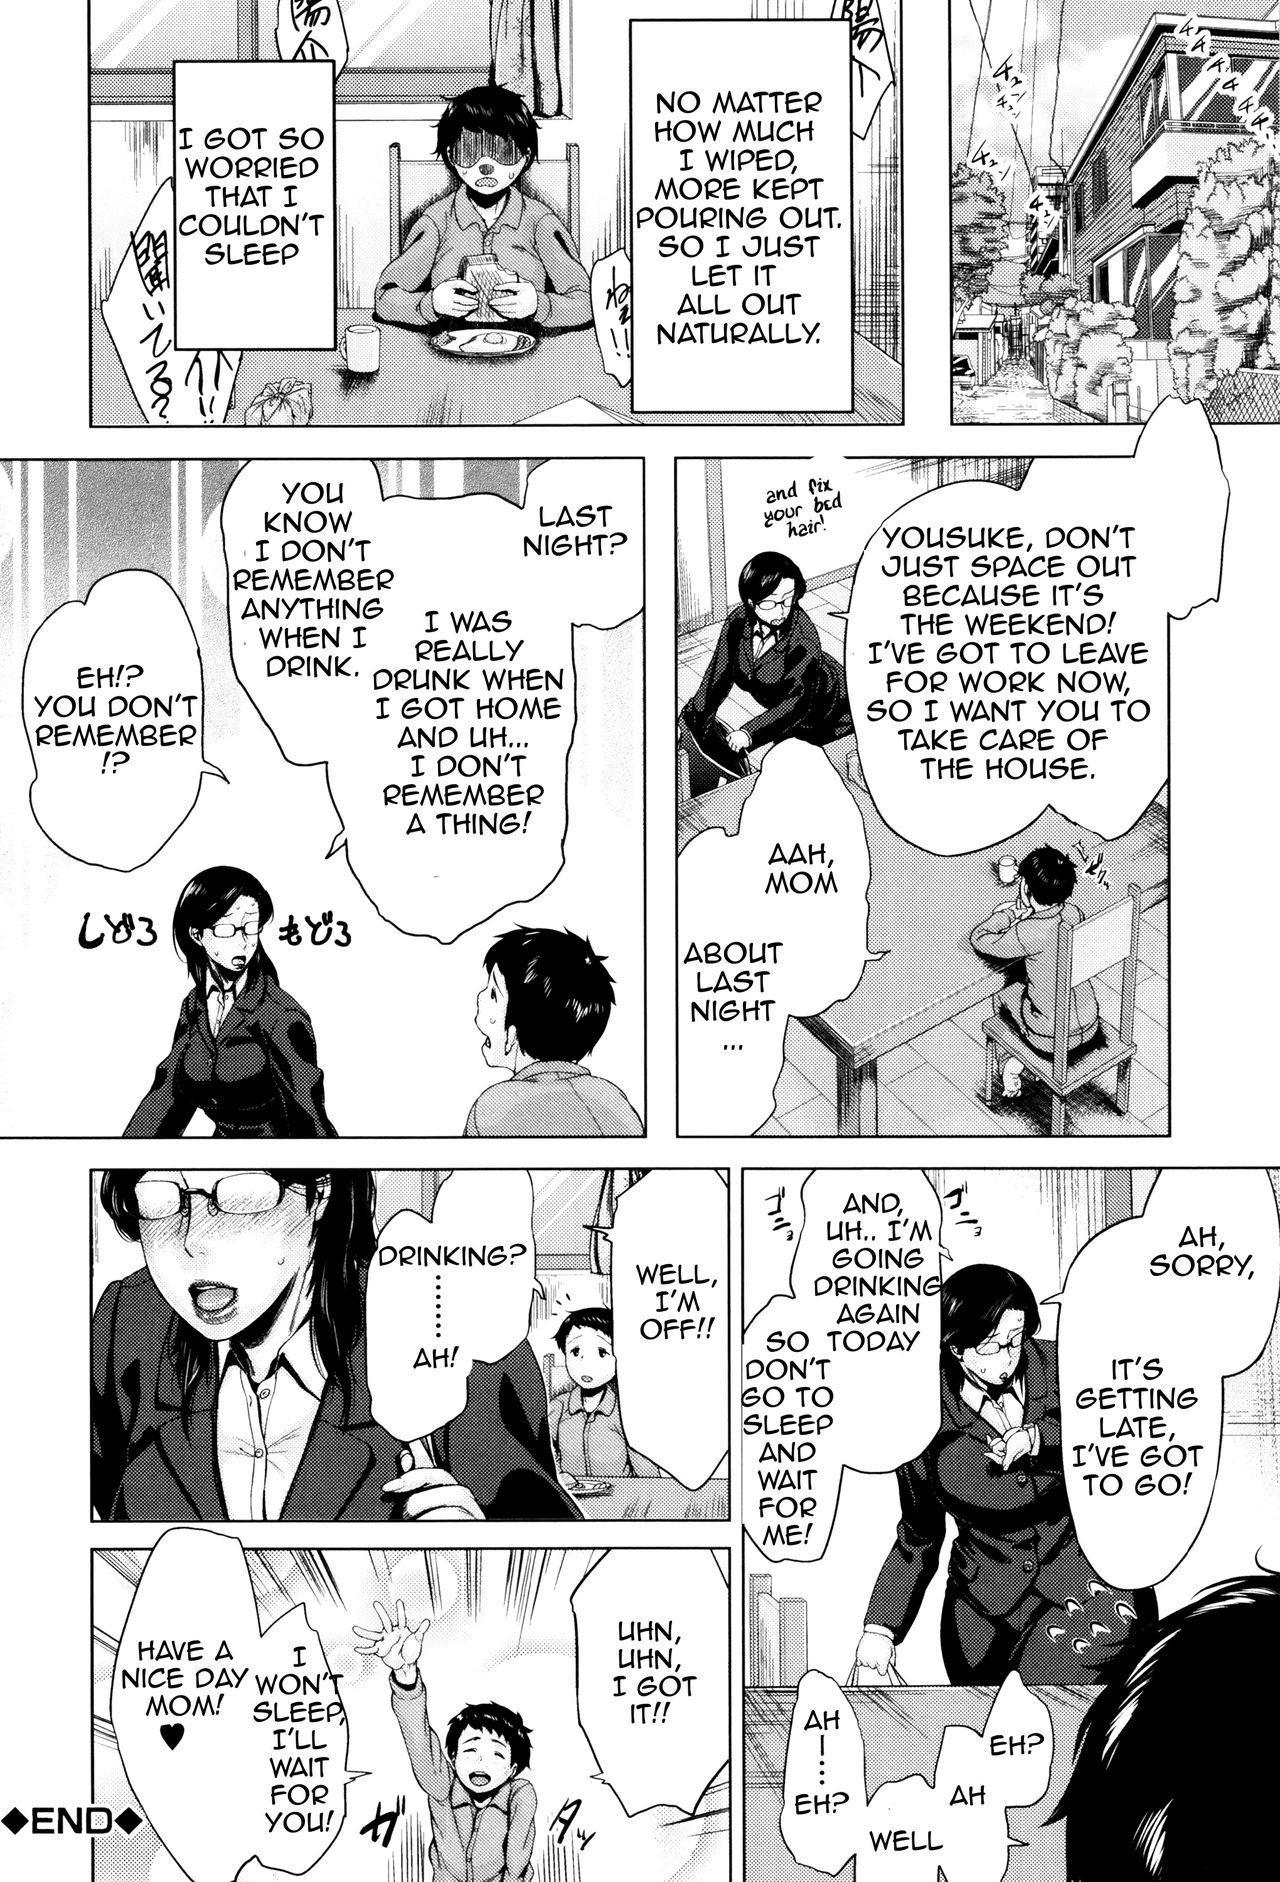 [Jitsuma] Kinyoubi no Haha-tachi e - To Friday's mothers [English] [Amoskandy, desudesu, Kusanyagi] 140